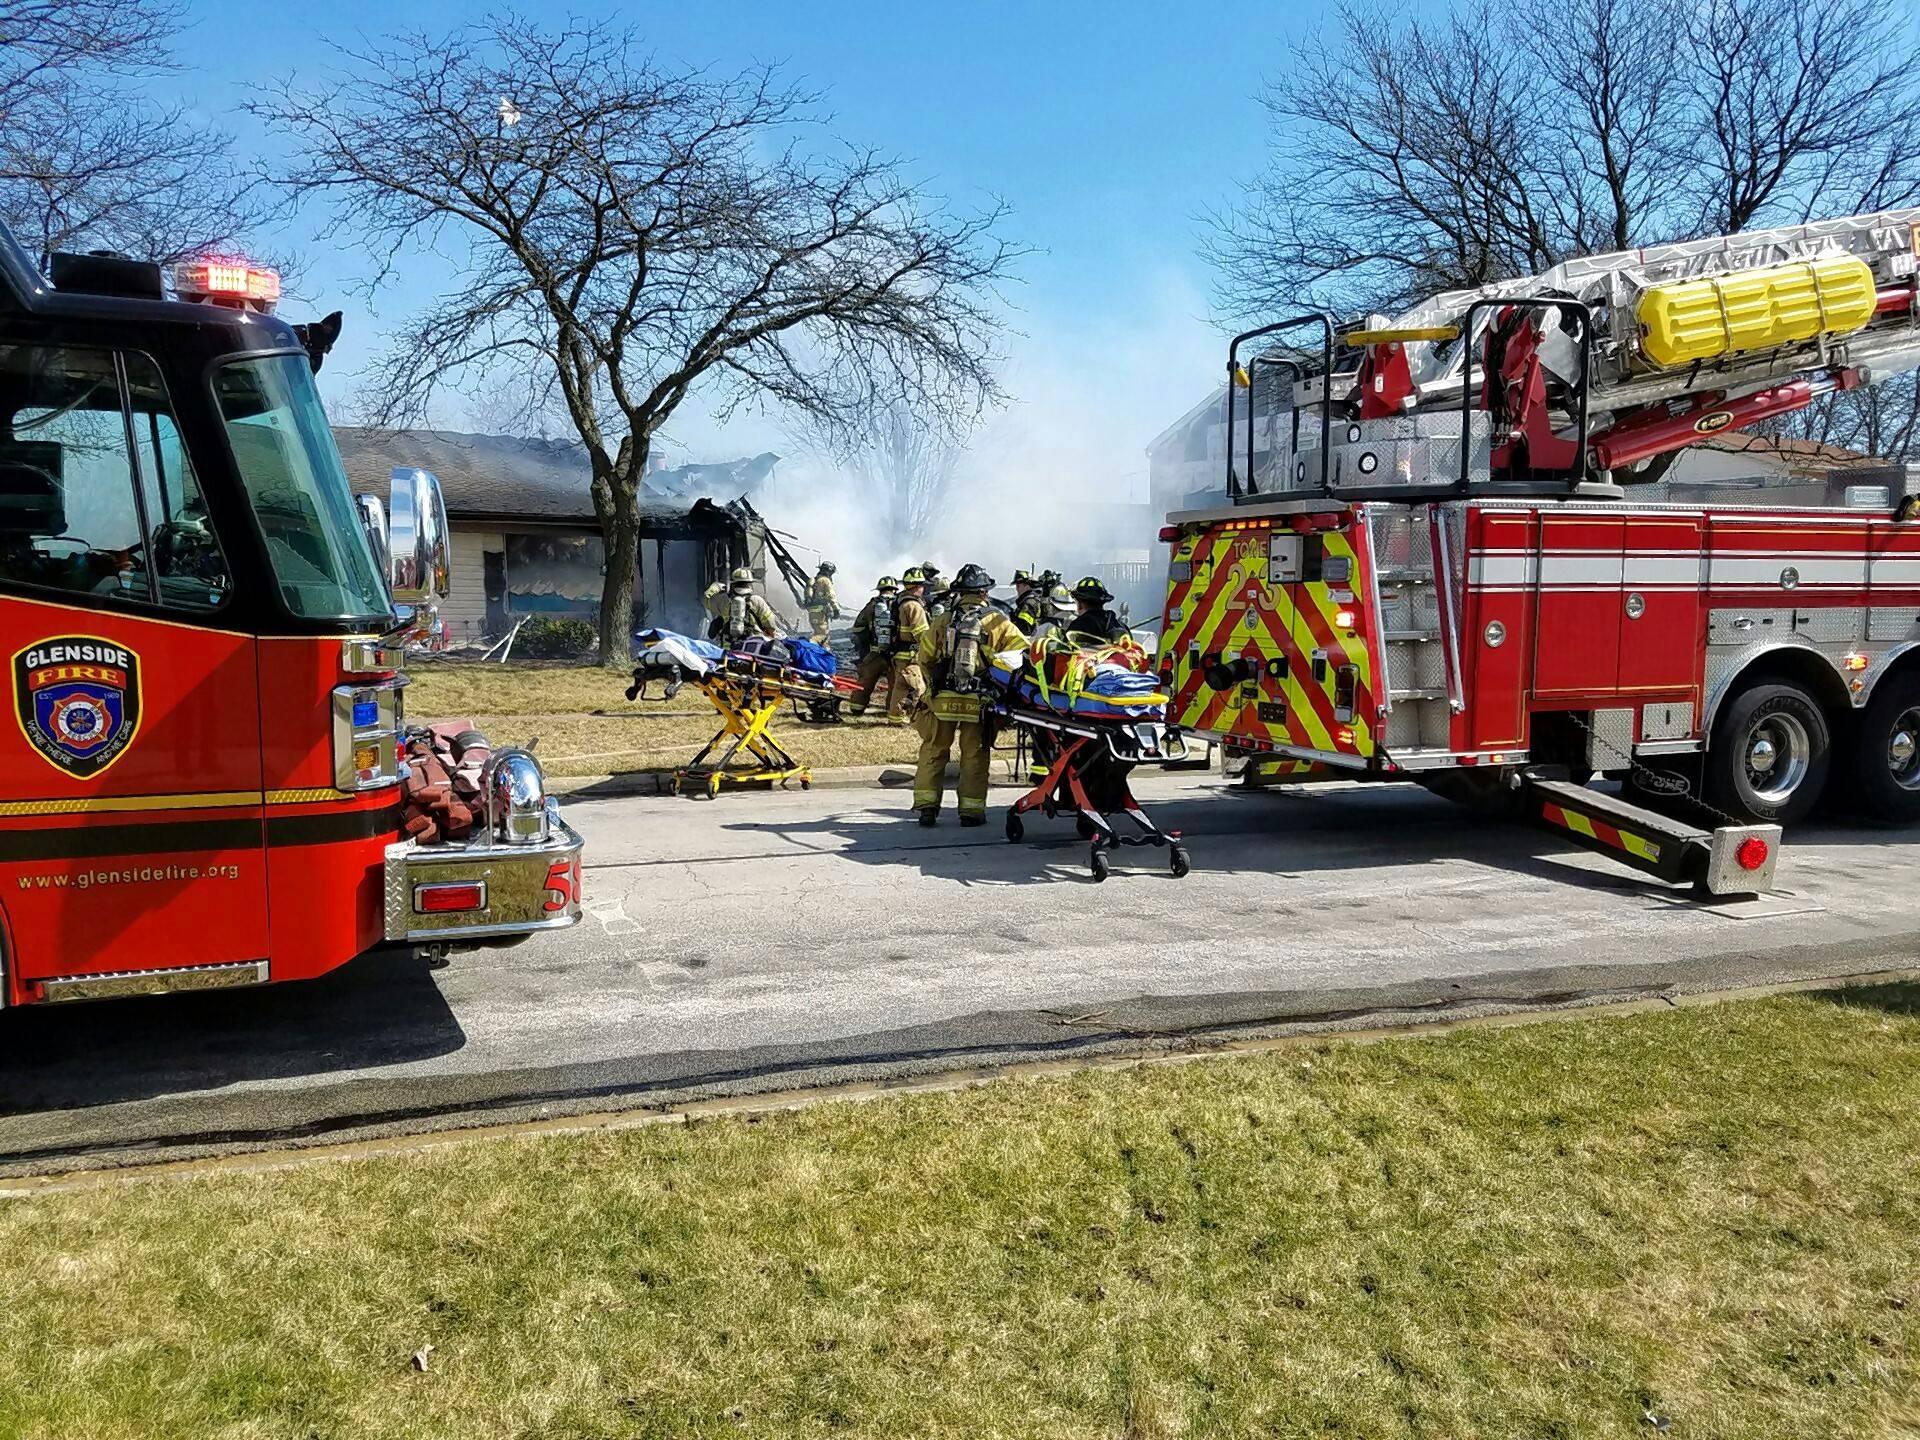 One hospitalized after Carol Stream house fire